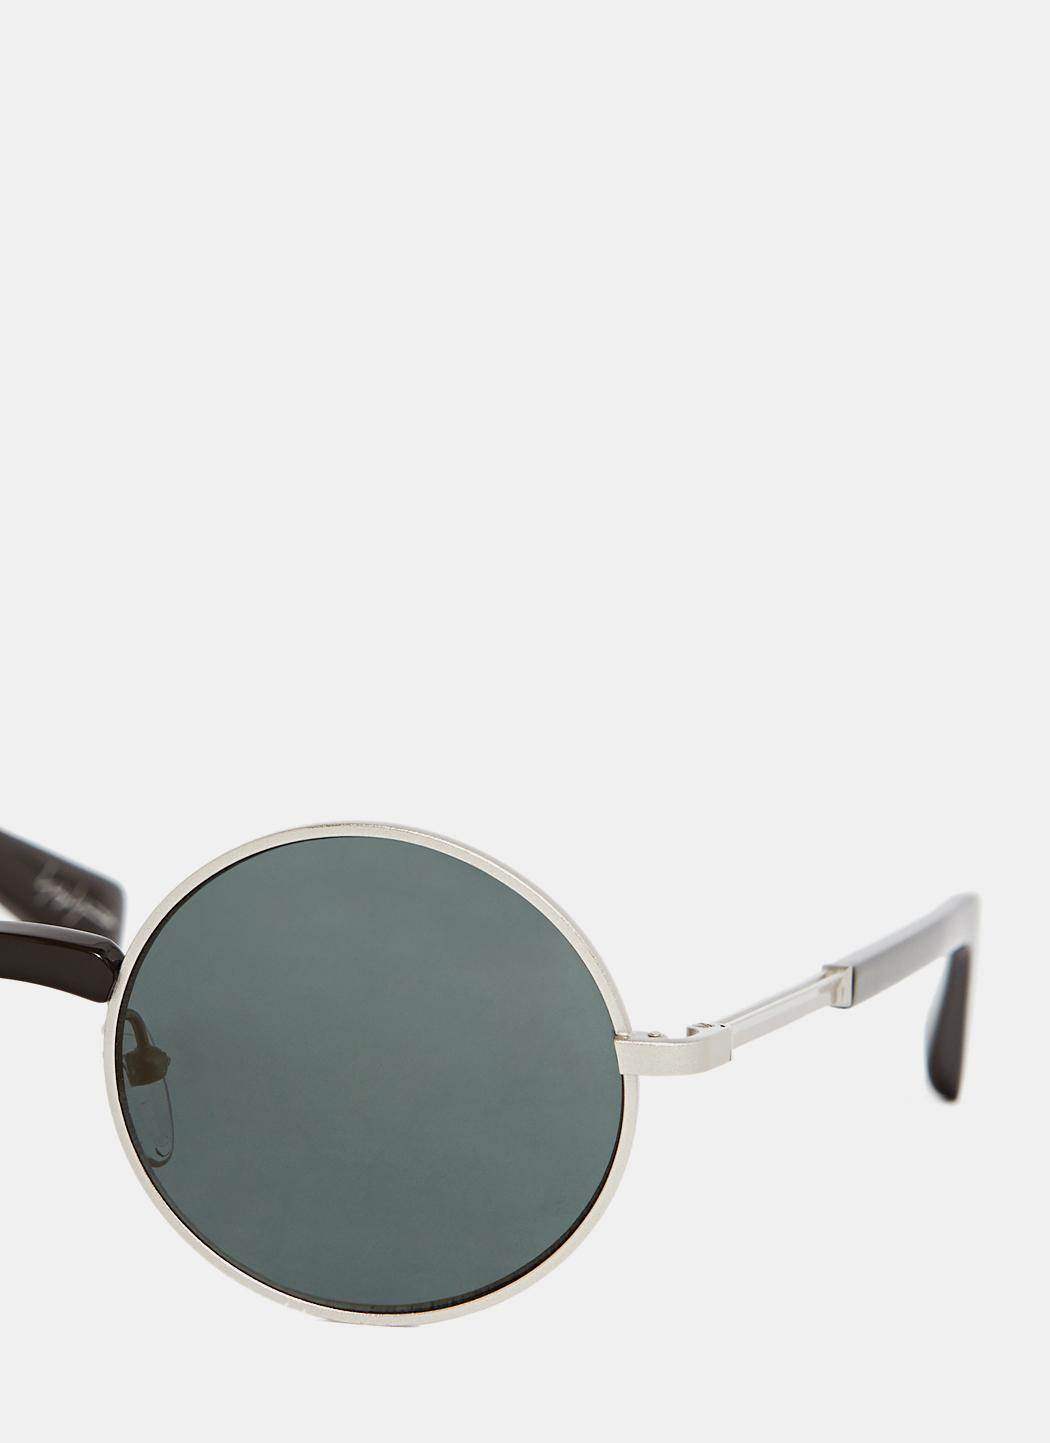 Yohji Yamamoto Men's Yy7002 Sunglasses In Silver in Metallic